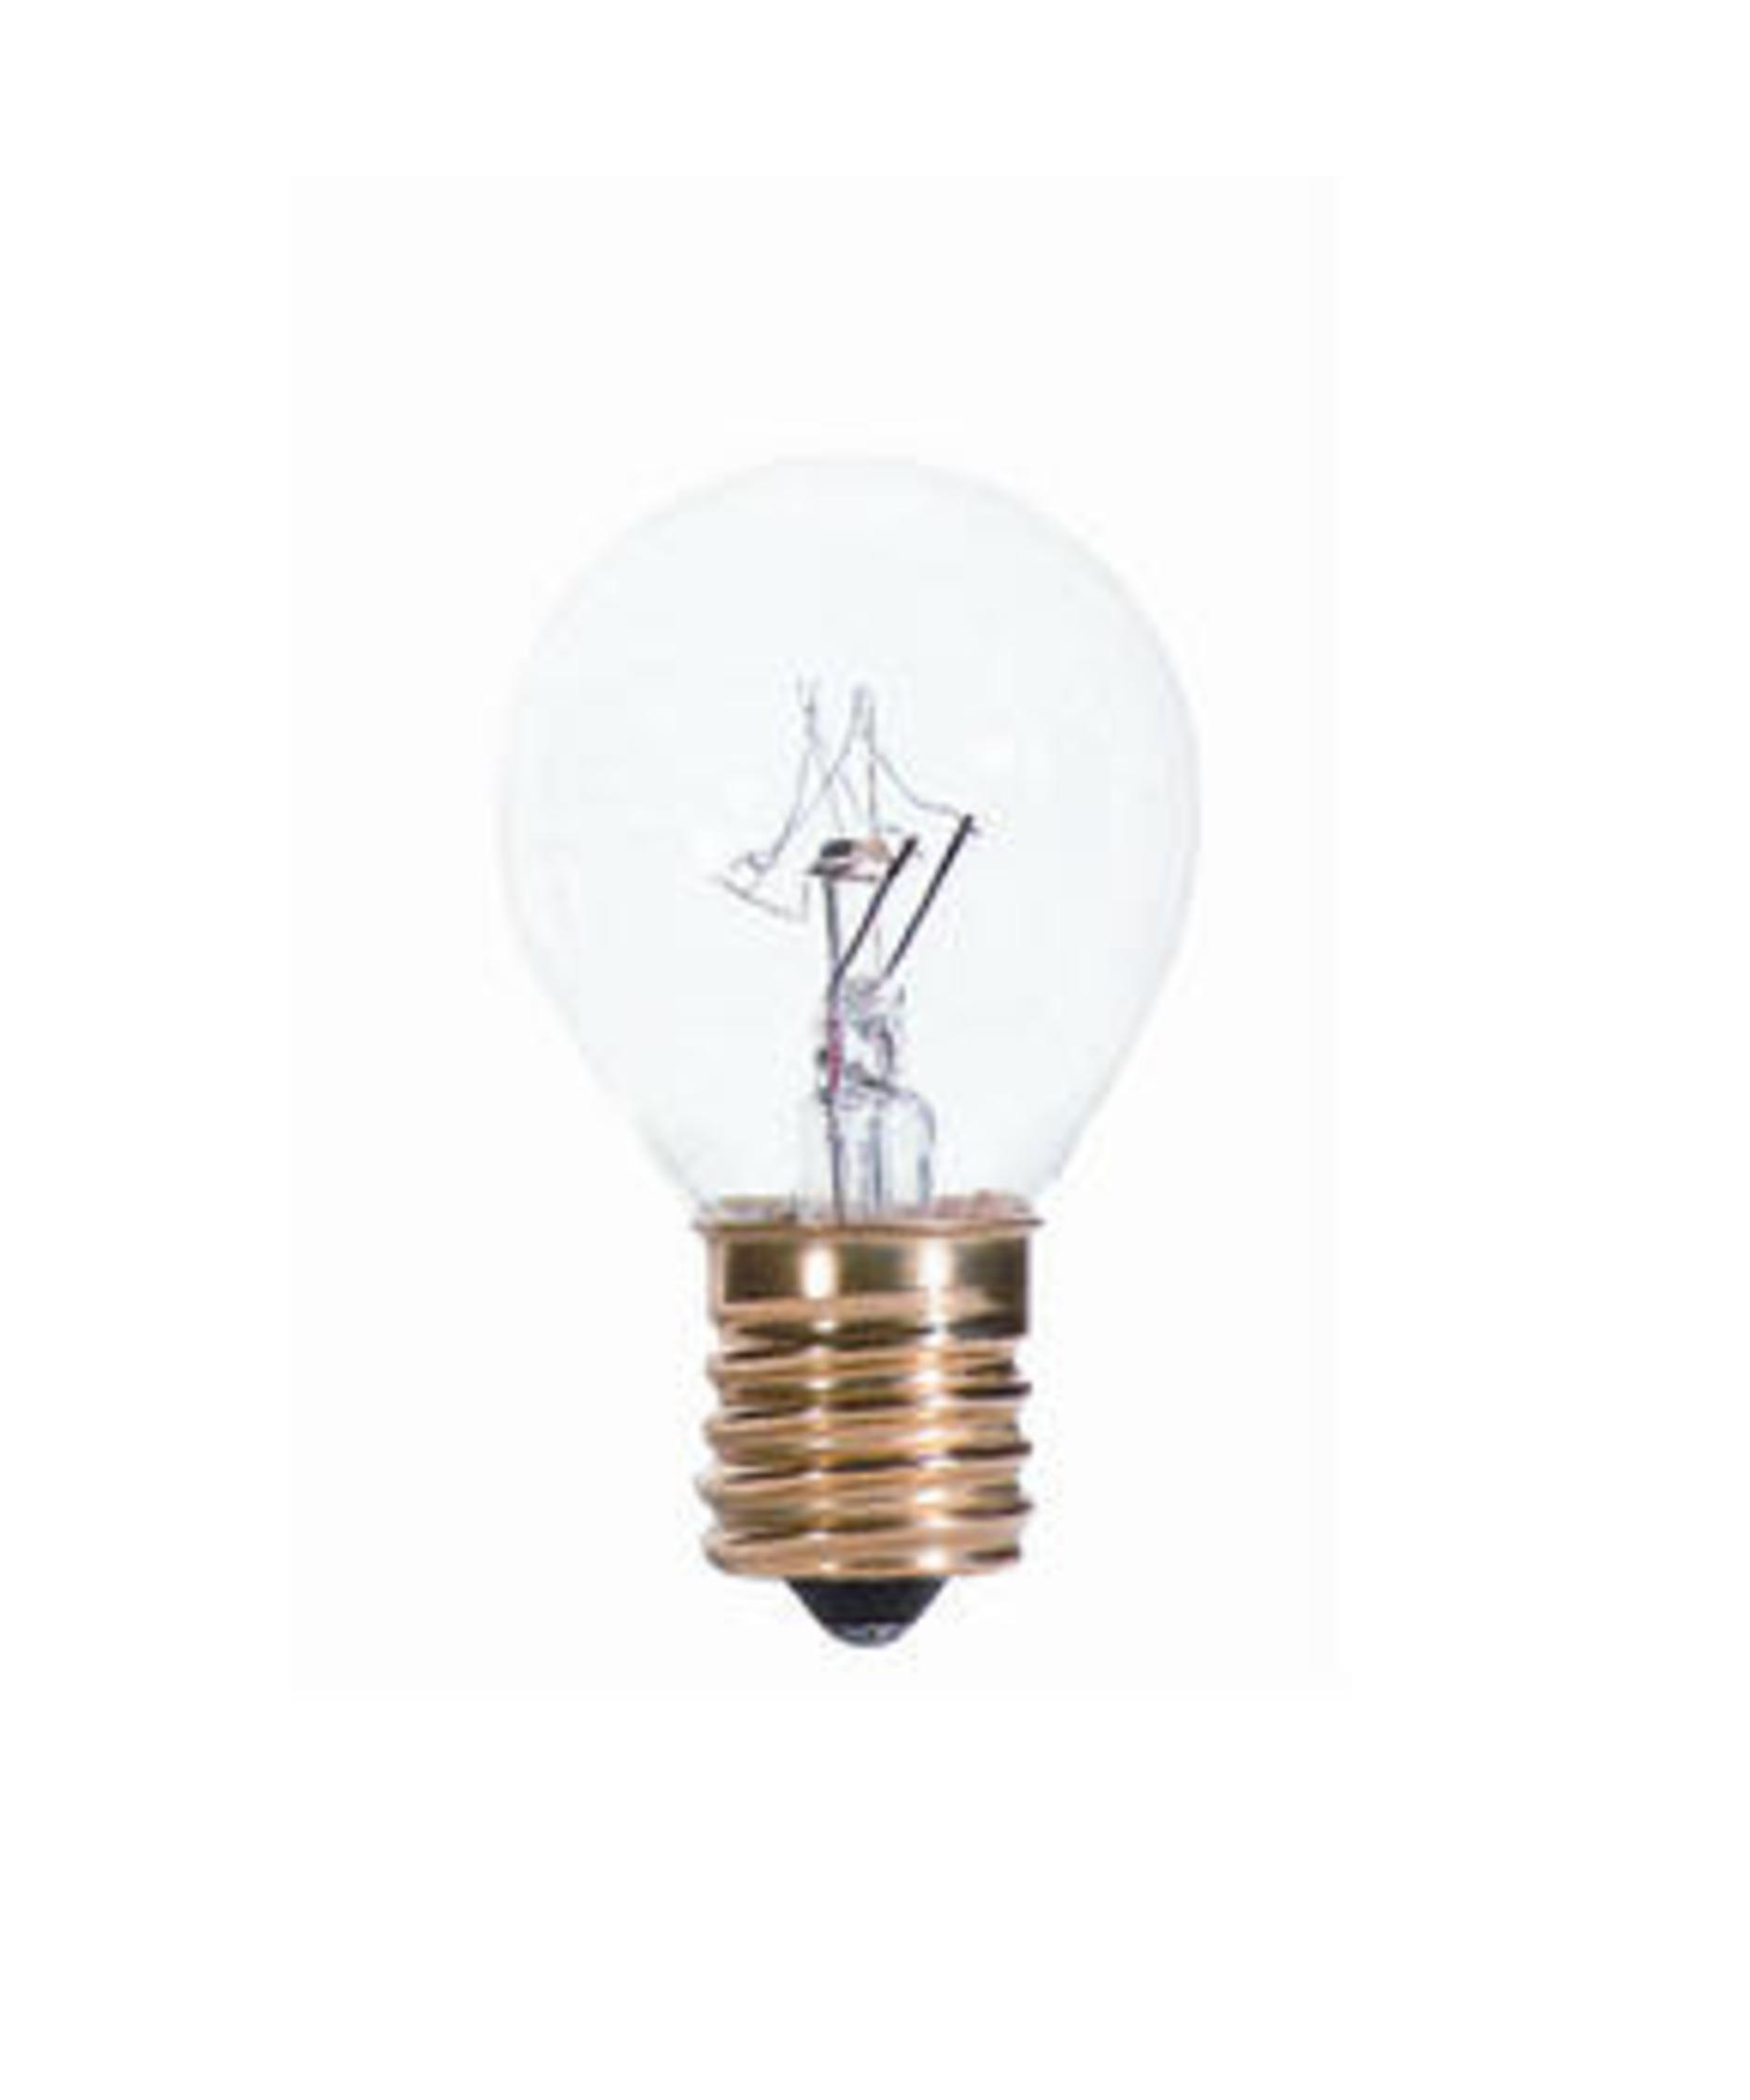 Bulbrite 40s11n C 40 Watt 120 Volt Clear High Intensity